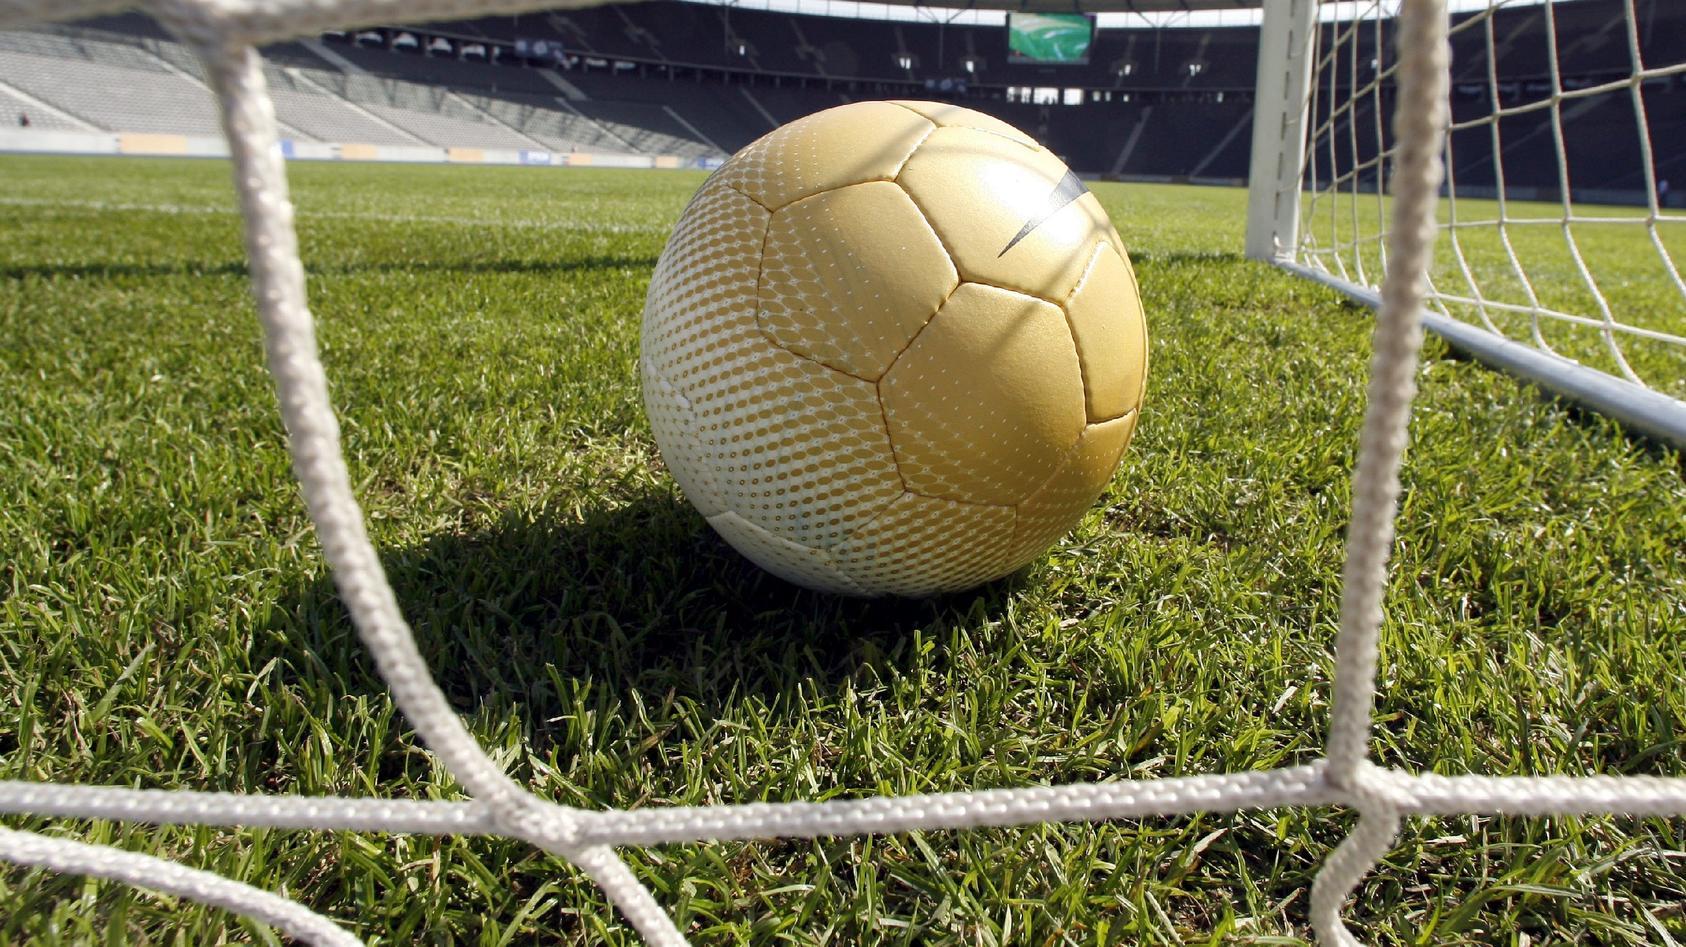 Schlimme Szenen im Amateur-Fußball